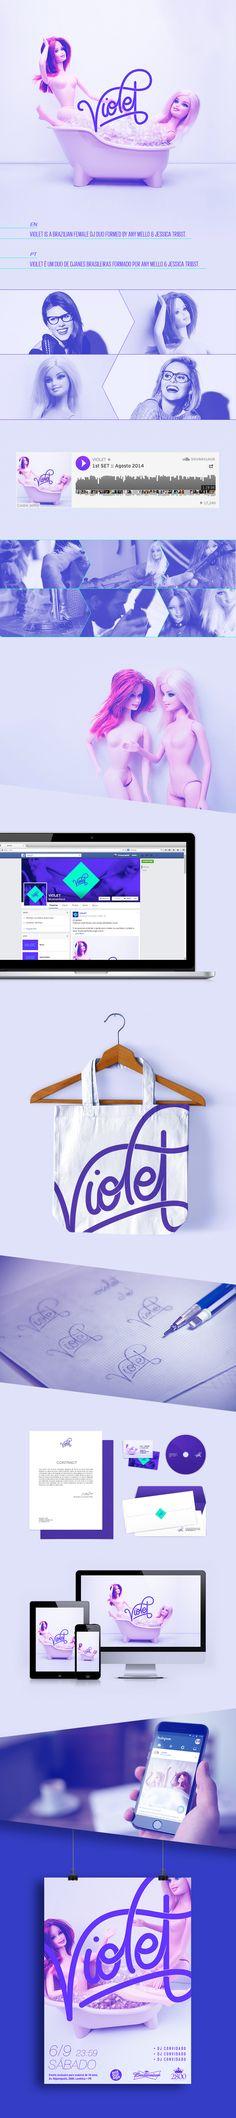 Violet by Pornographitti Explicit Design #branding #emusic #music #brazil…